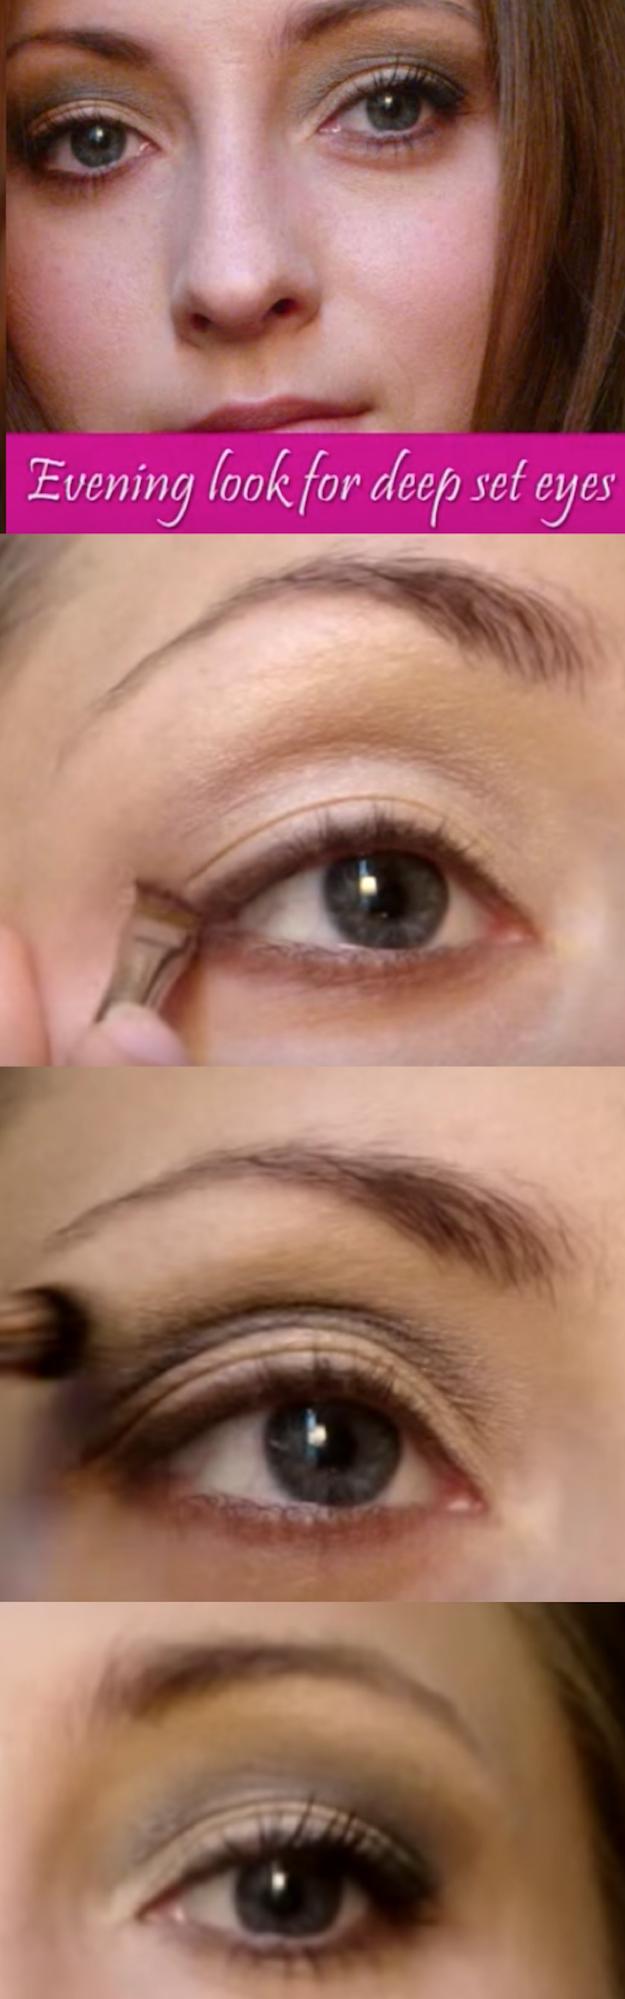 Deep Set Hooded Eyes Makeup 32 Best Makeup Tips For Deep Set Eyes The Goddess